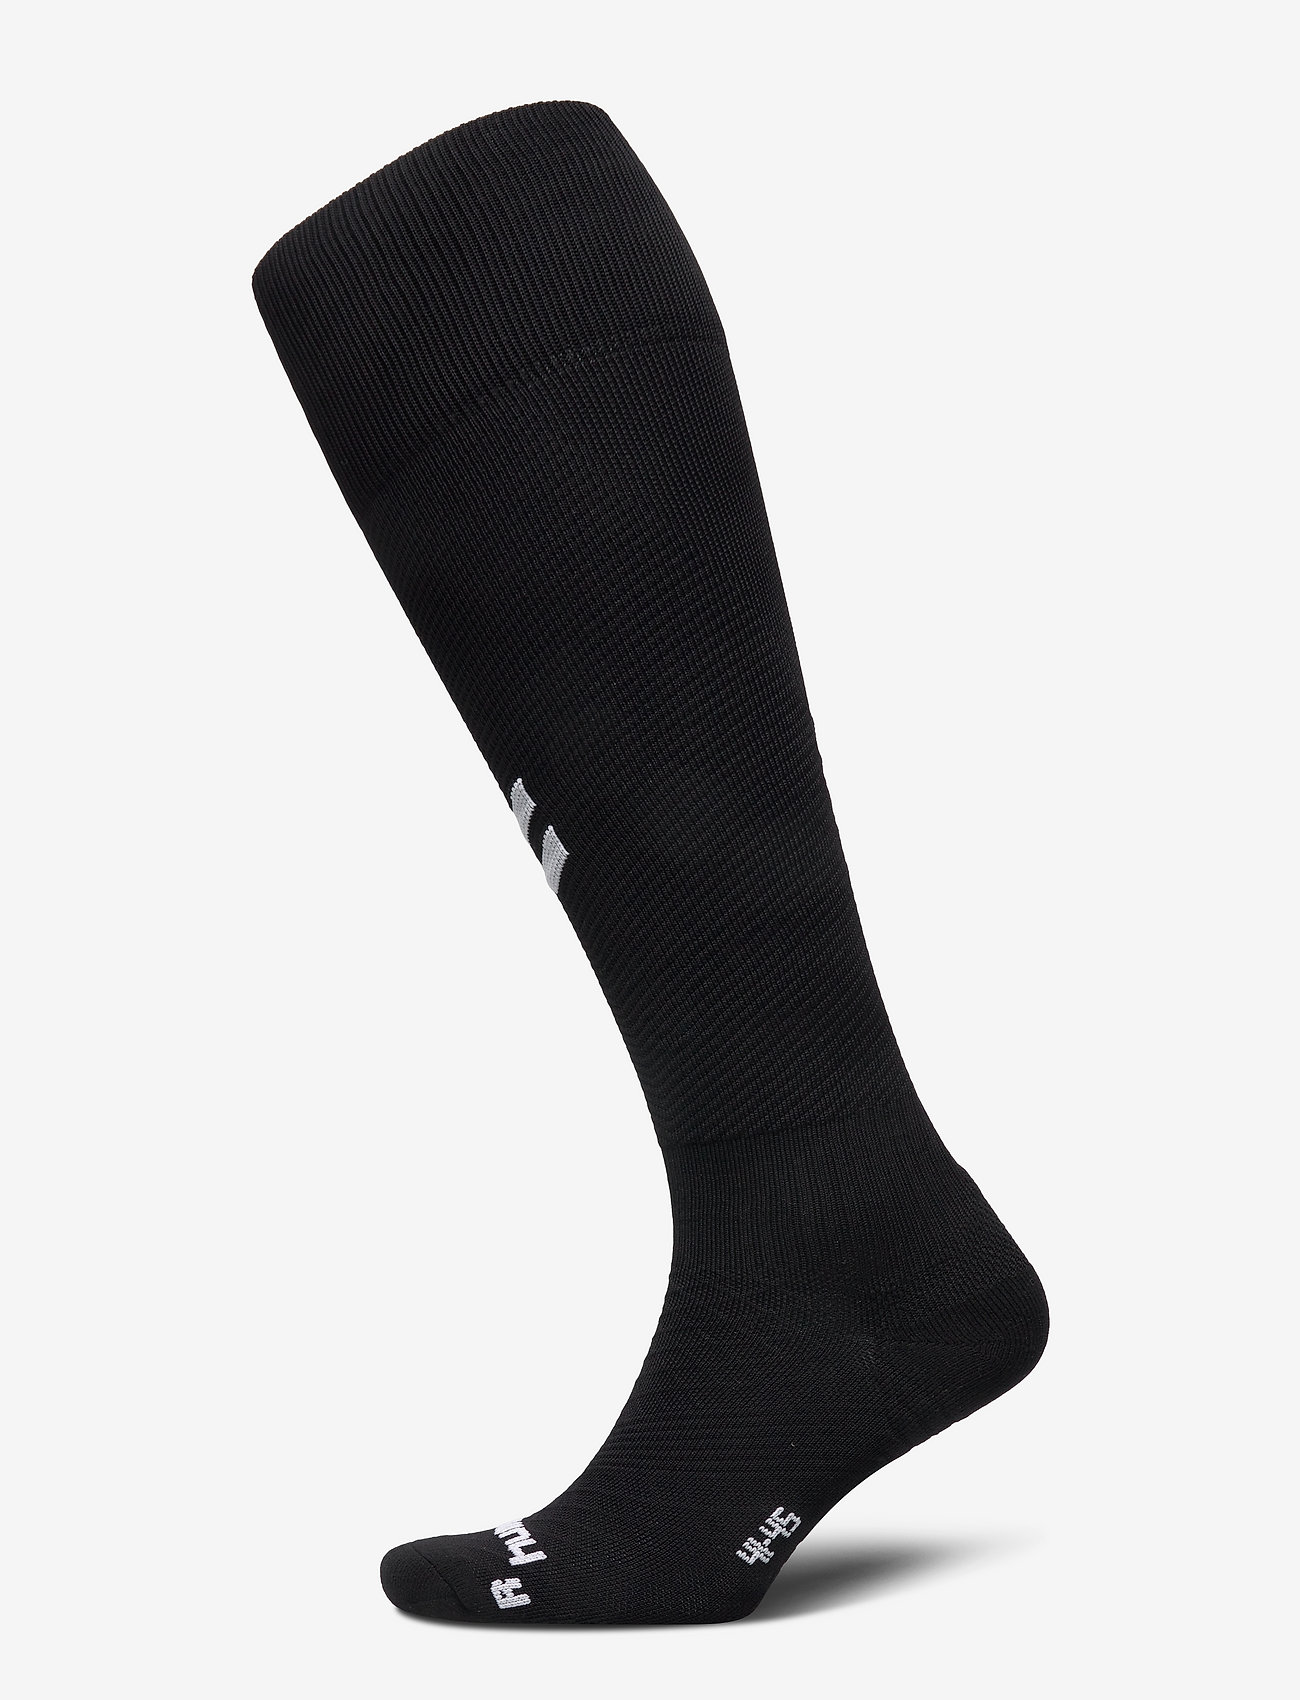 Hummel - DBU 20/21 FOOTBALL SOCK - fodboldsokker - black - 0